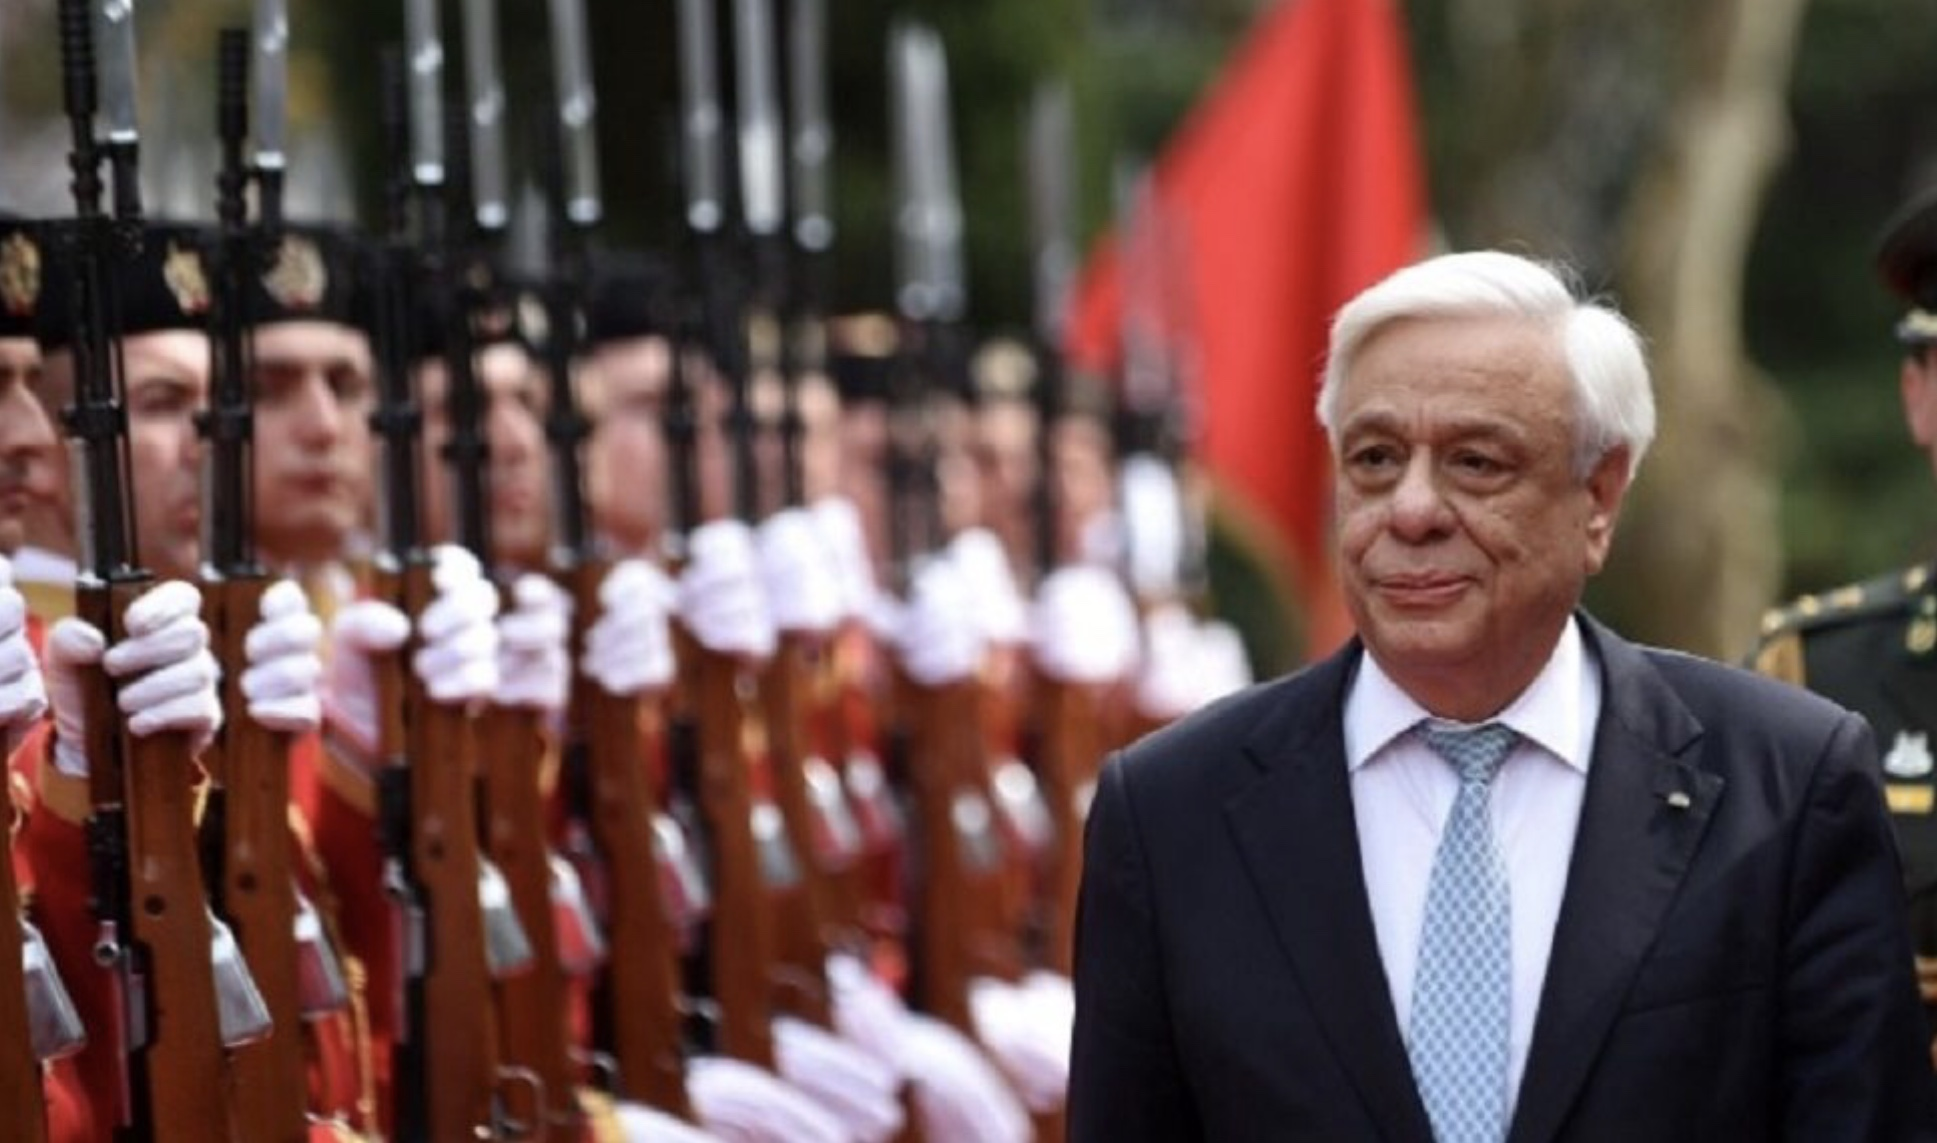 "Mανώλης Κοττάκης ""Αλλη η ειδική βαρύτητα του Προκόπη Παυλόπουλου που παίρνει τηλέφωνο τον Γκουτιέρες και ακυρώνει τις συντεταγμένες του Ερντογαν στον ΟΗΕ"" [ΒΙΝΤΕΟ]"